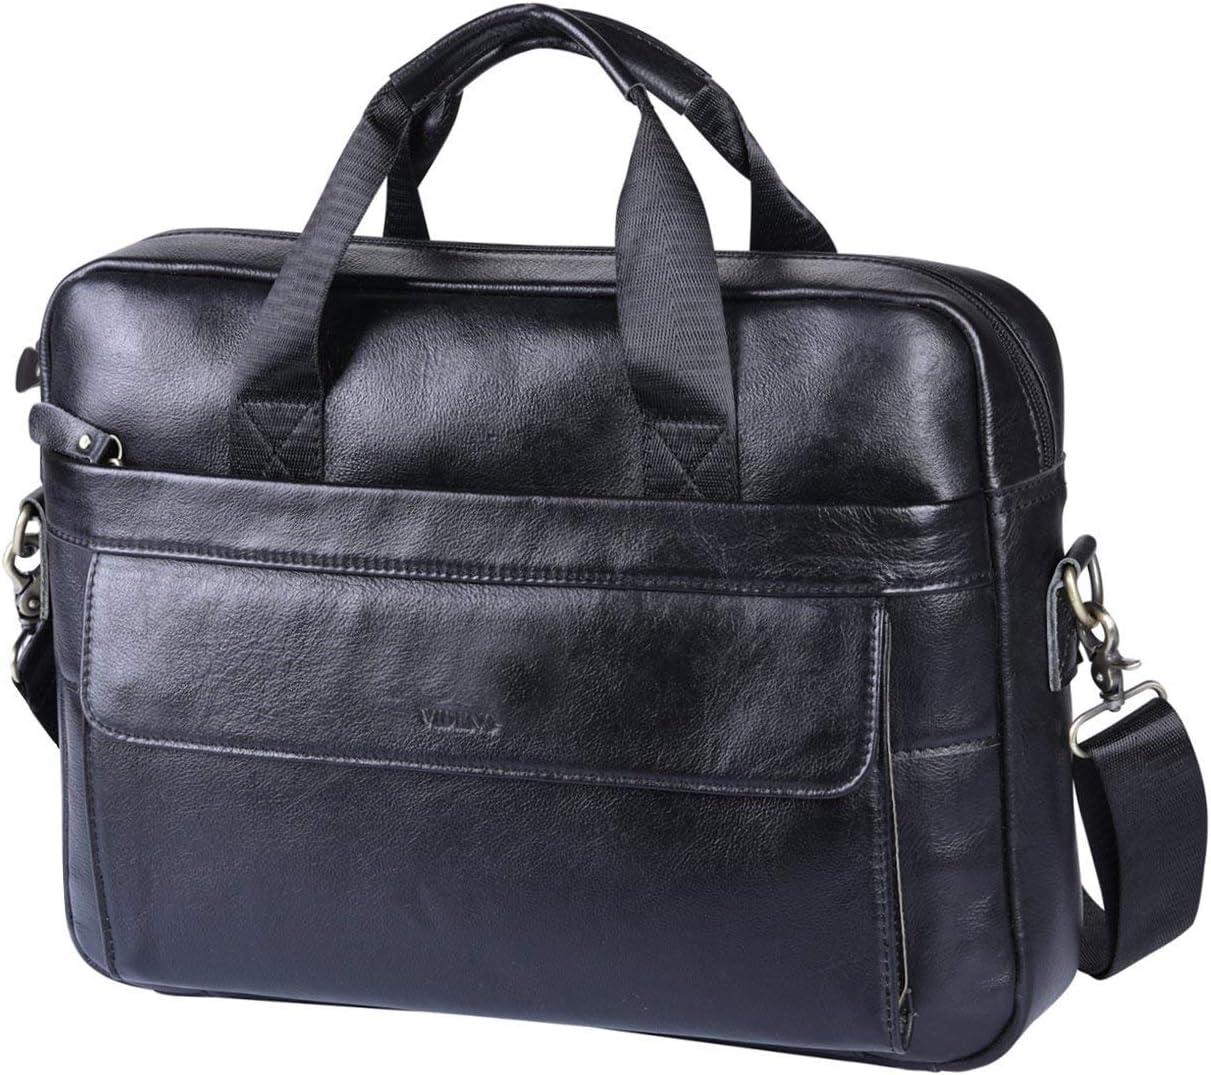 VIDENG piel maletín, Authentique piel 14 pulgadas portátil bolsa ...